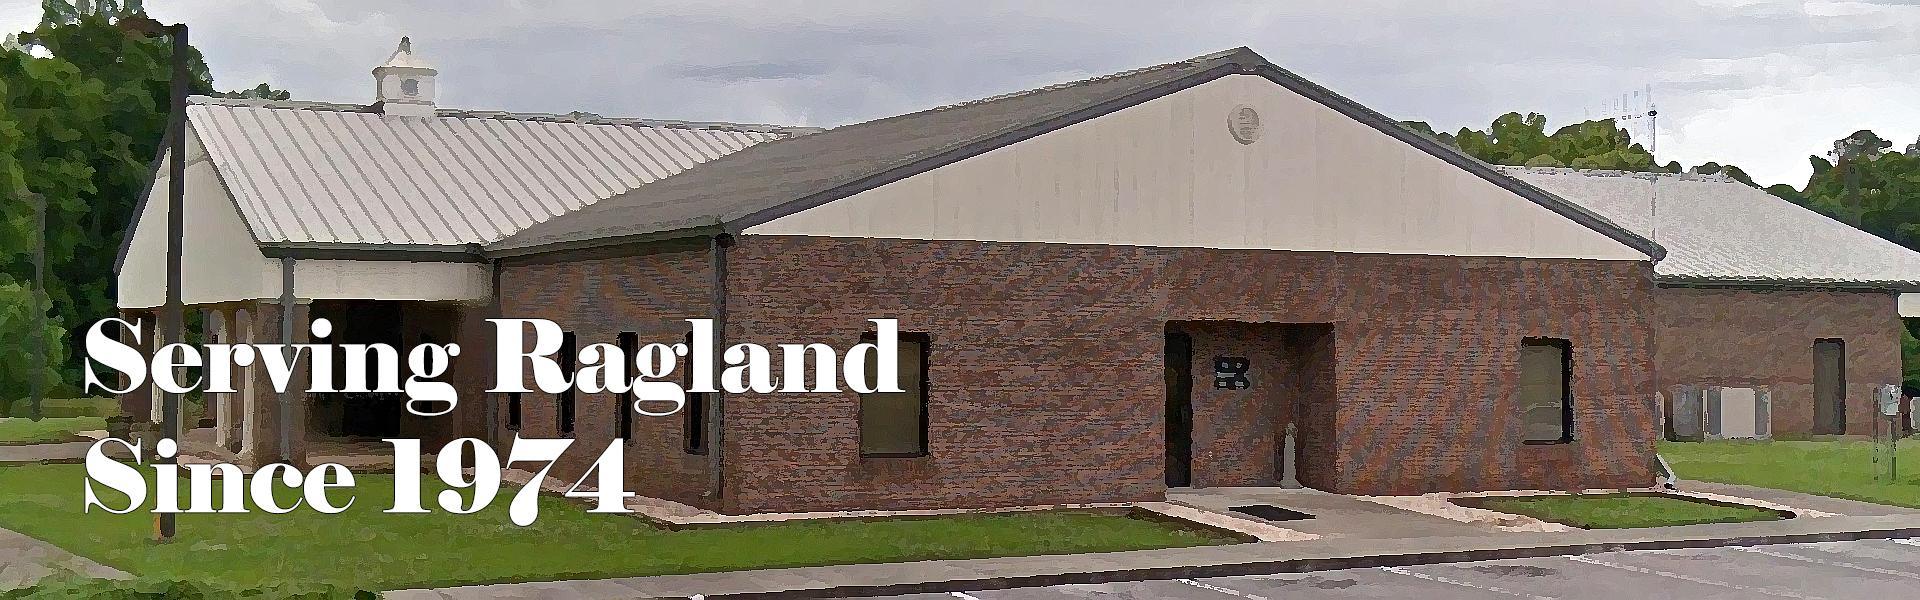 Ragland Water Works, 220 Fredia Street, Ste 101, Ragland, AL 35131-Phone: (205) 472-0409|Fax: (205) 472-2154 Hours: 8:00 am - 4:00 pm, M-F